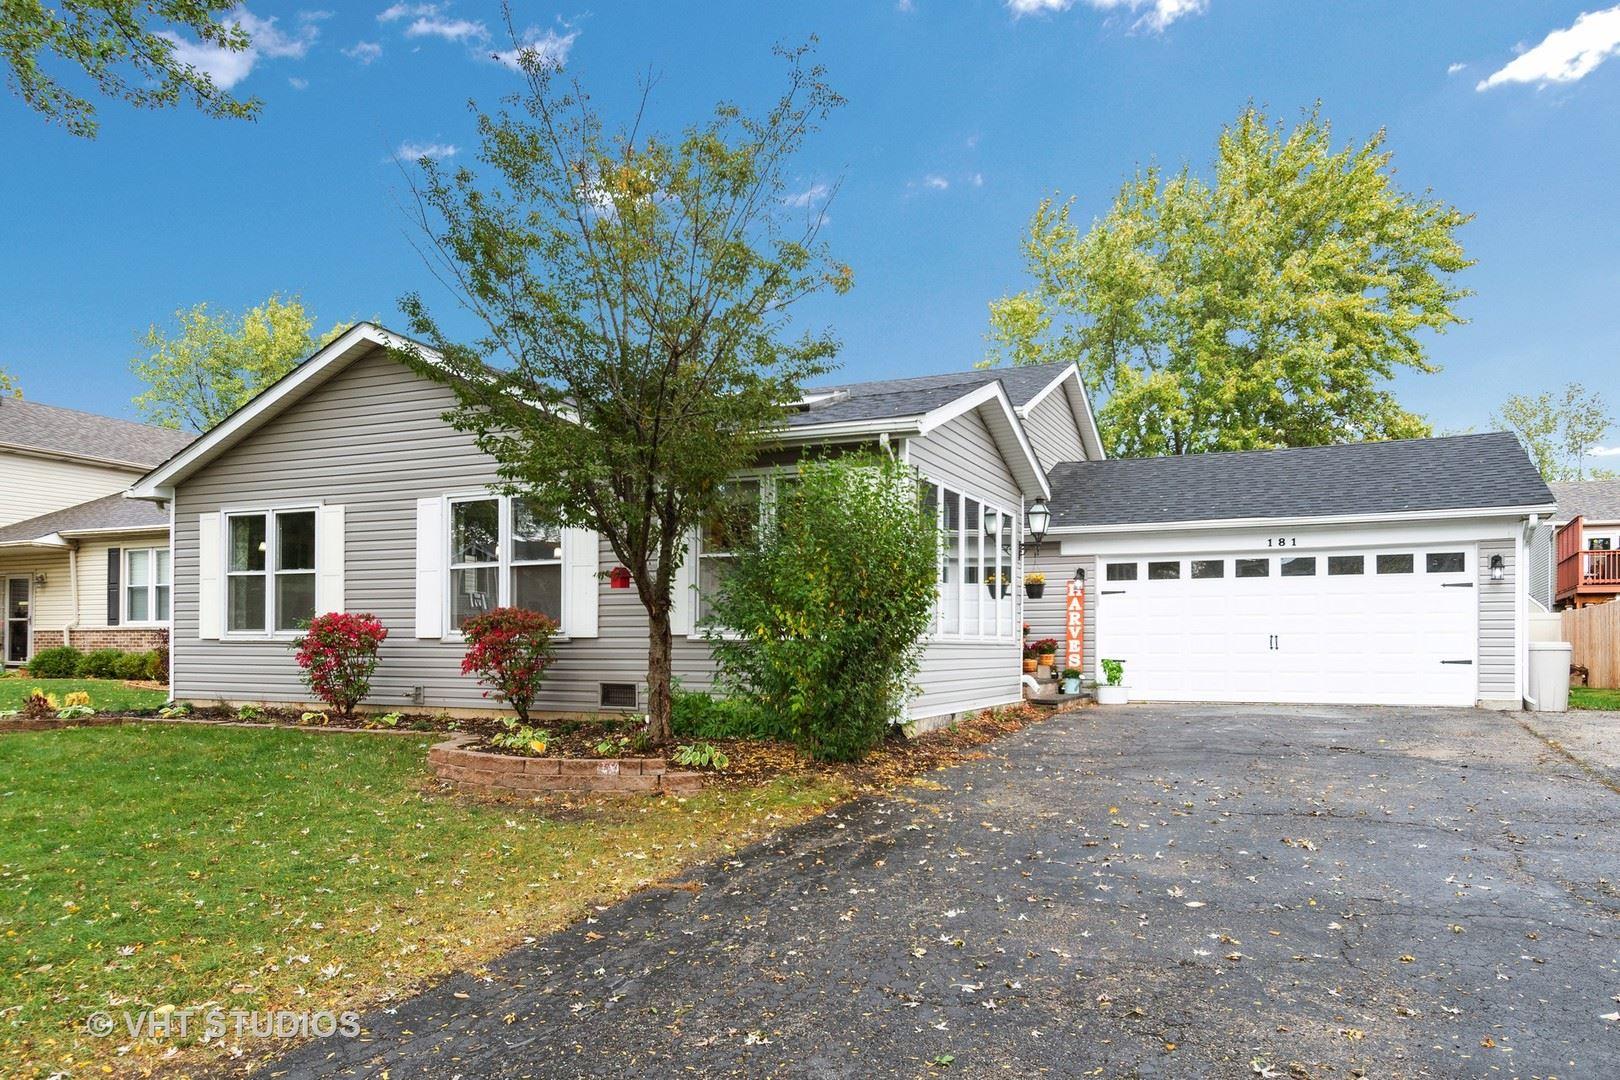 Photo of 181 Farm Gate Lane, Bolingbrook, IL 60440 (MLS # 10904148)